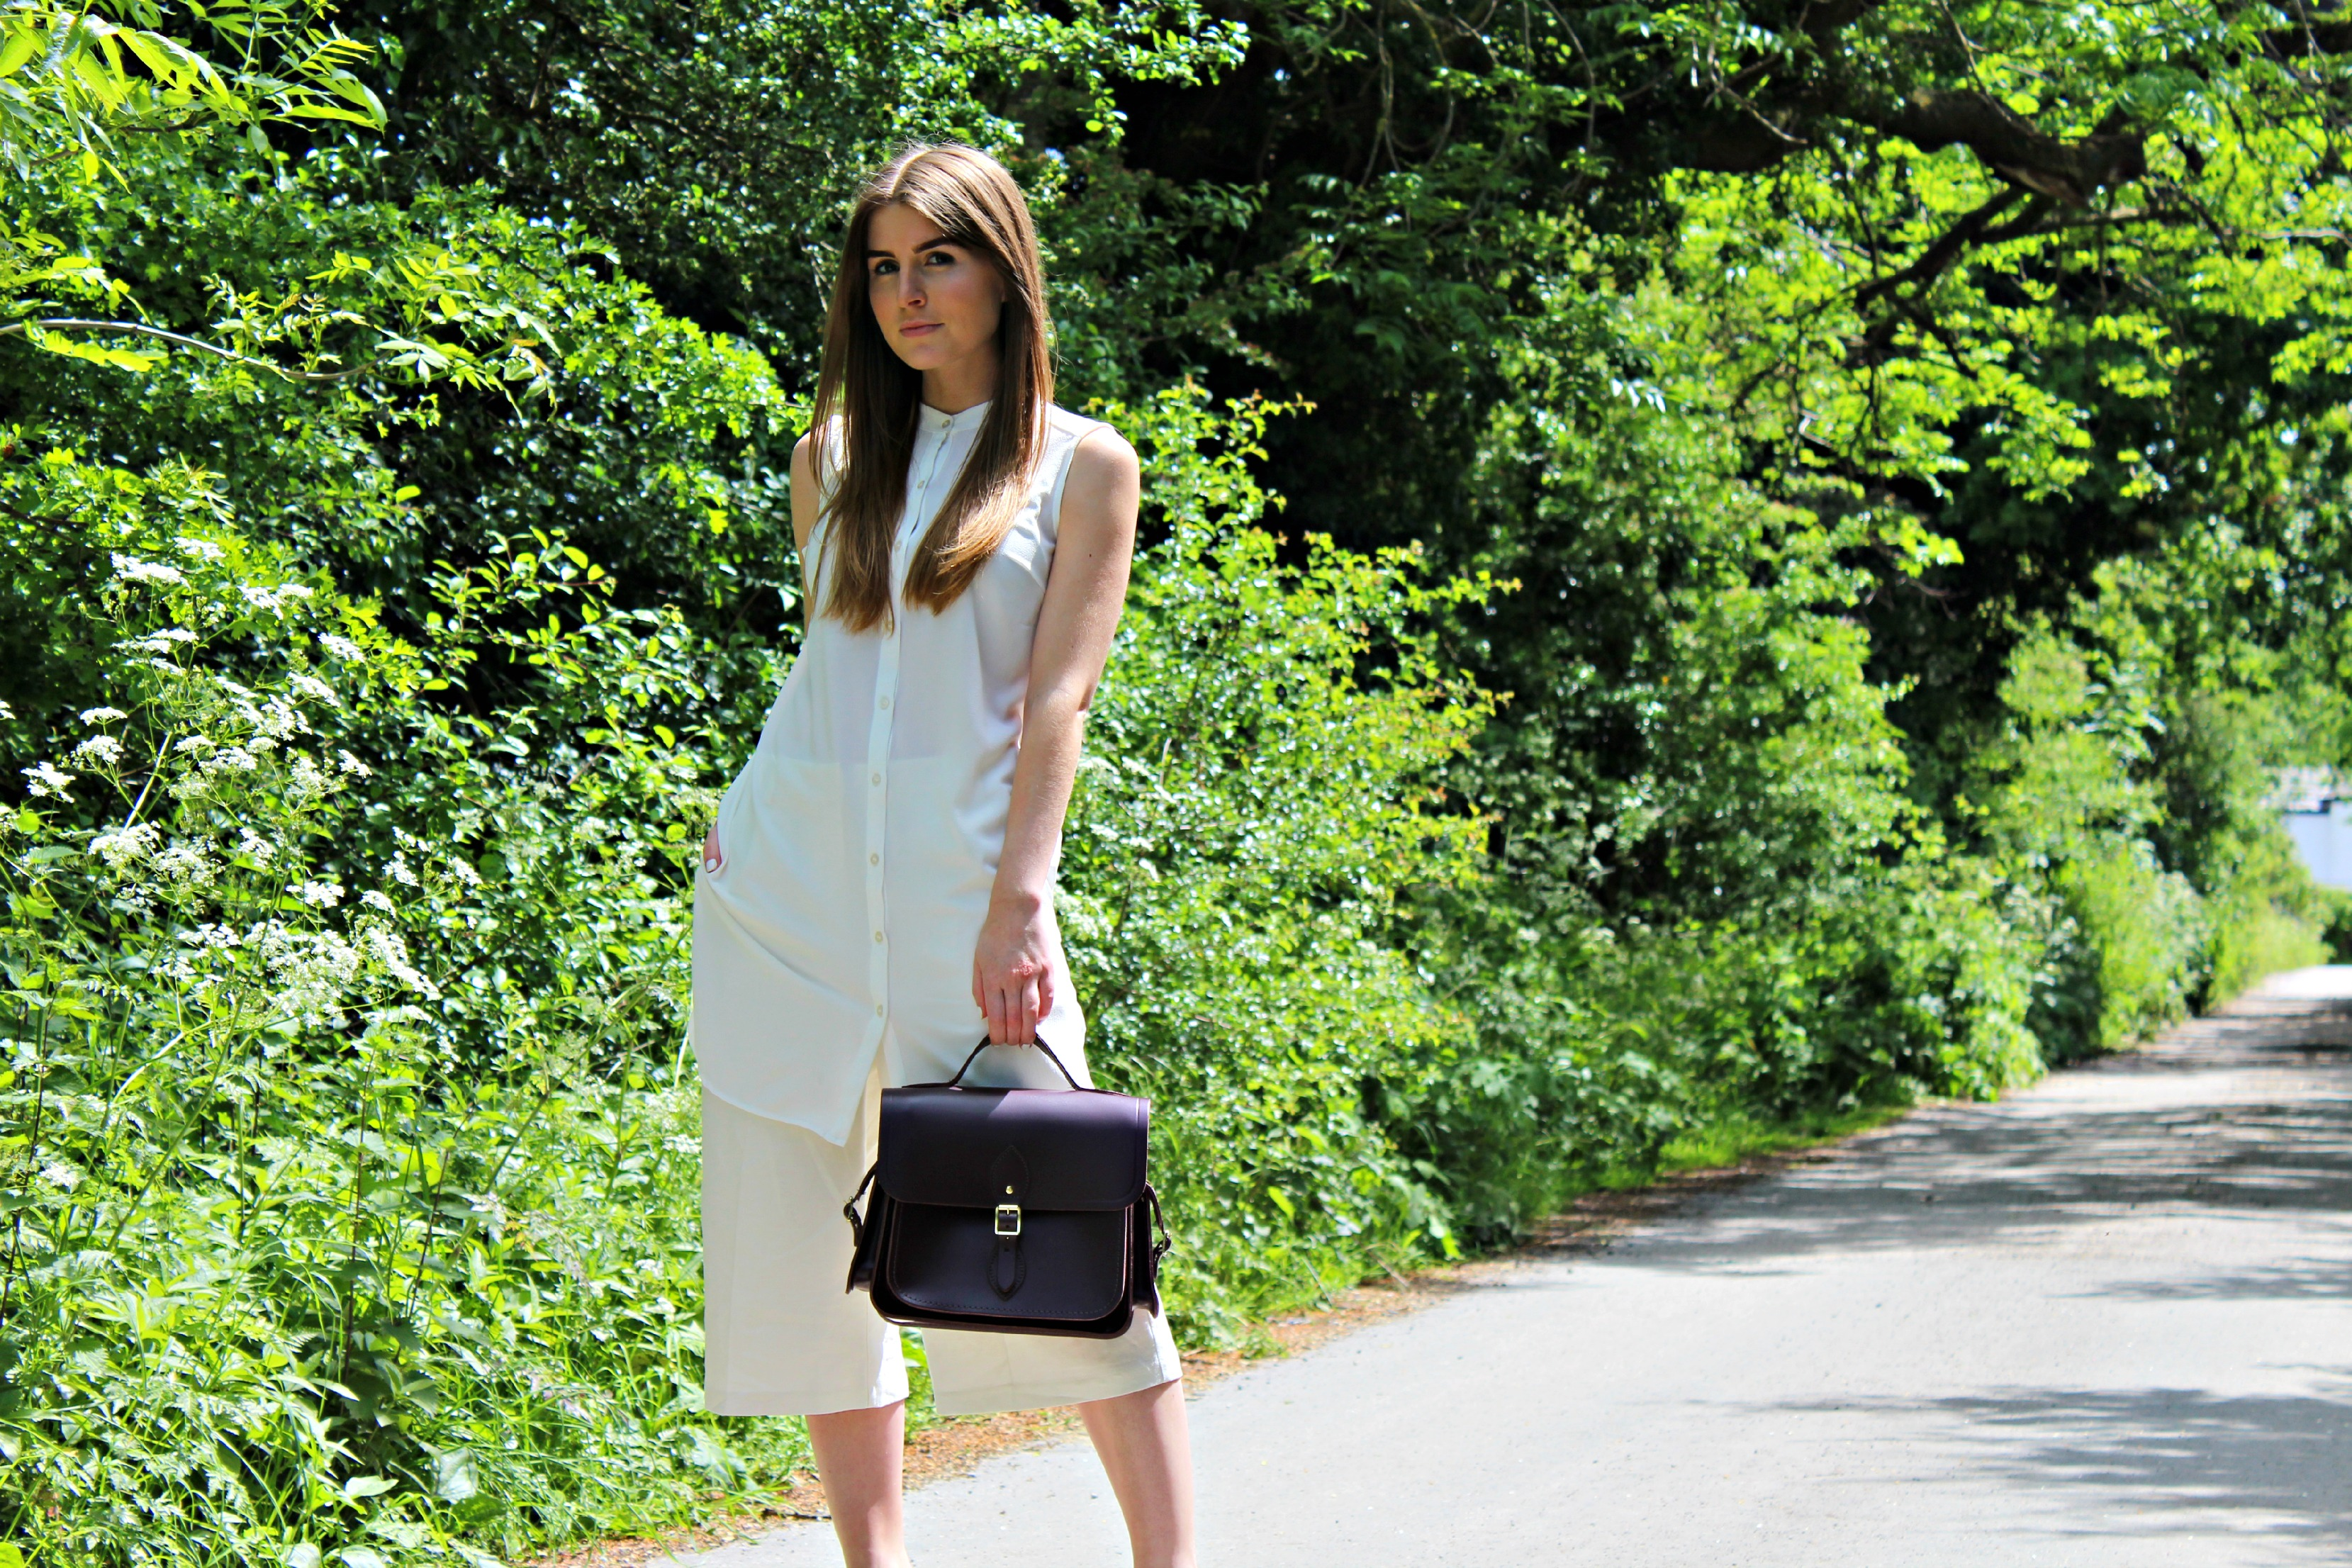 cambridge-satchel-company-large-traveller-bag